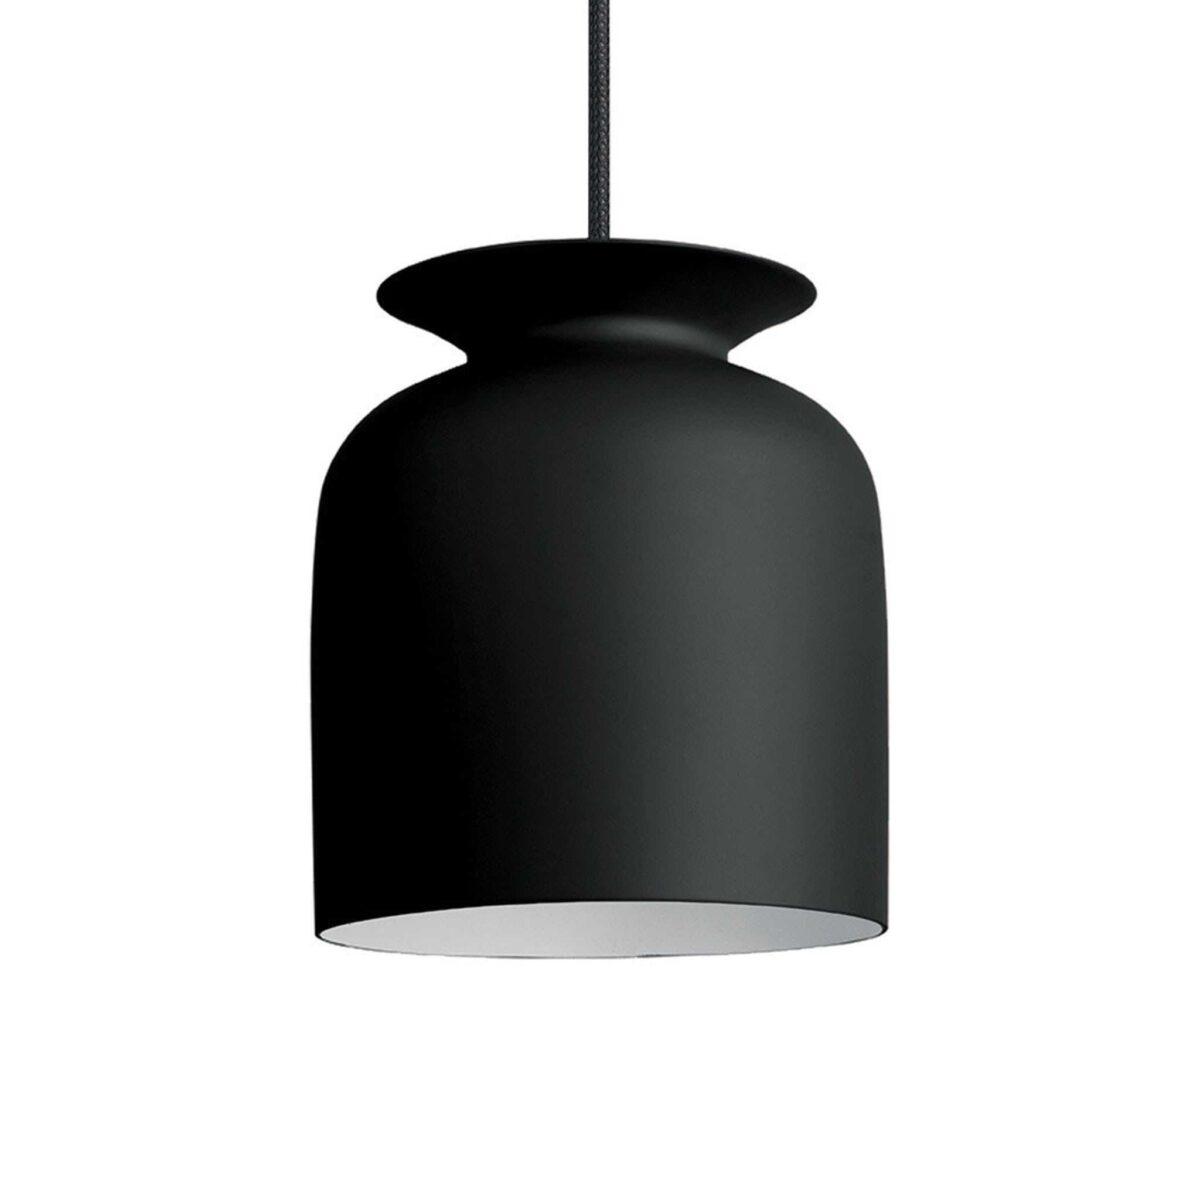 gubi-ronde-pendant-charcoal-black-001